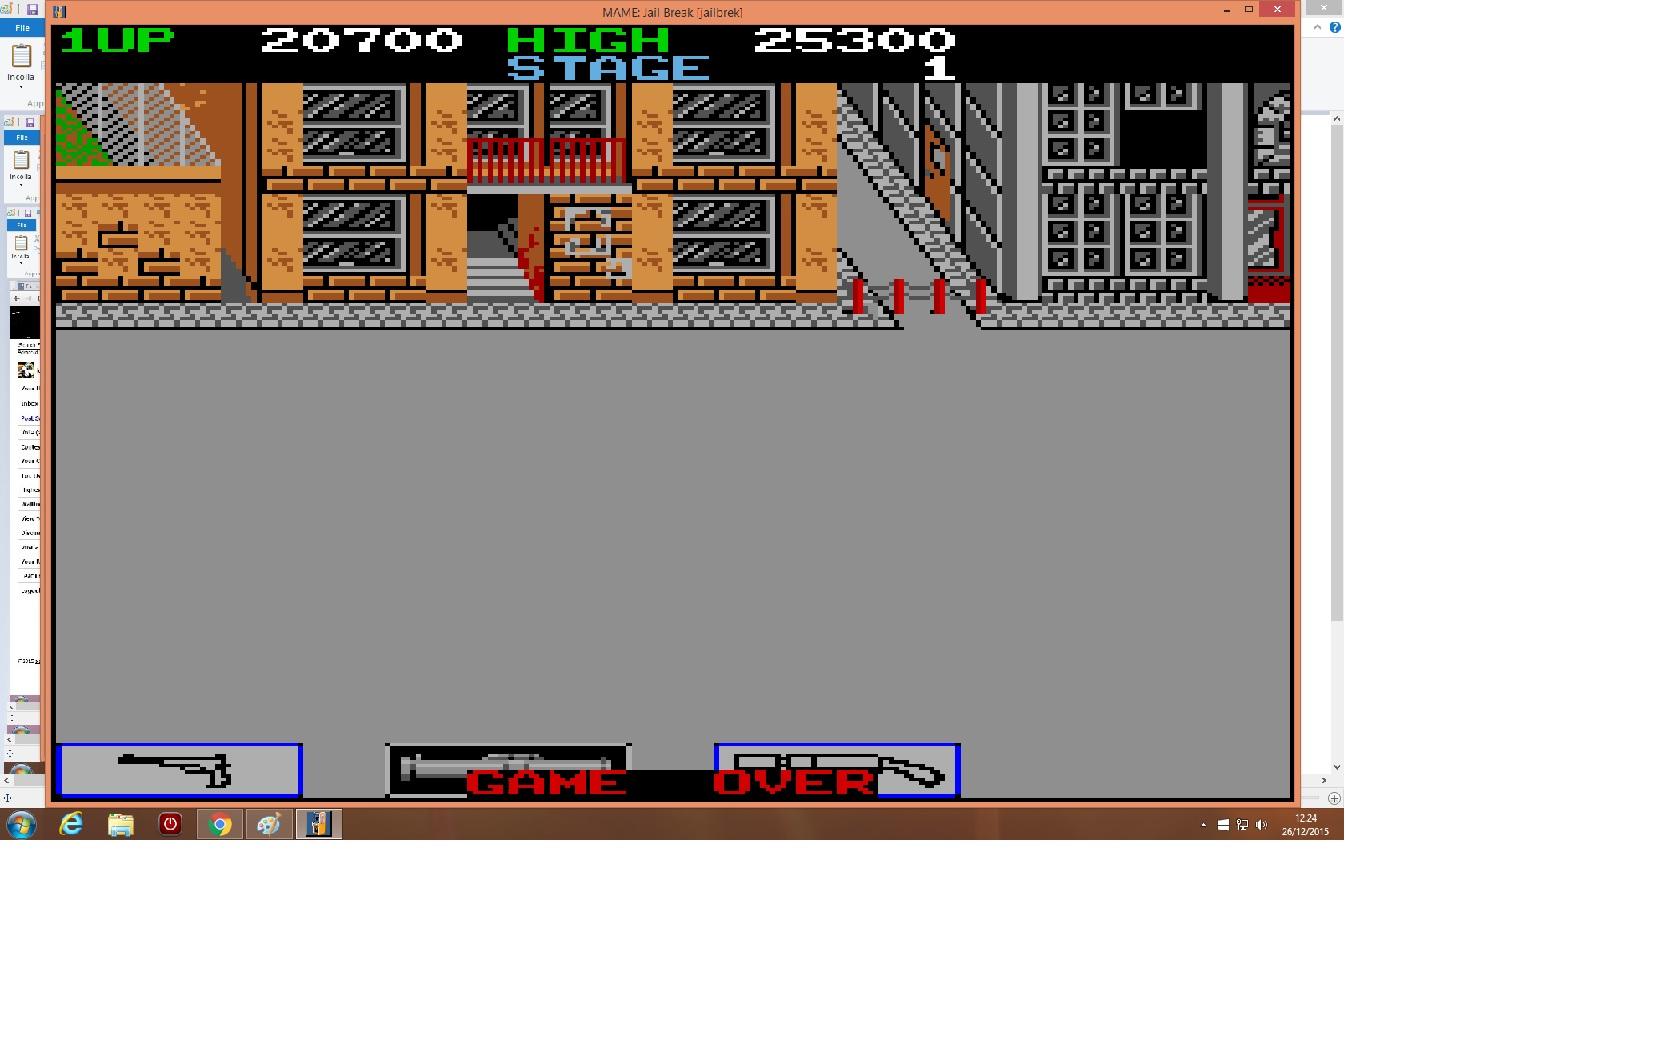 lenny2571: Jail Break [jailbrek] (Arcade Emulated / M.A.M.E.) 20,700 points on 2015-12-26 05:25:12